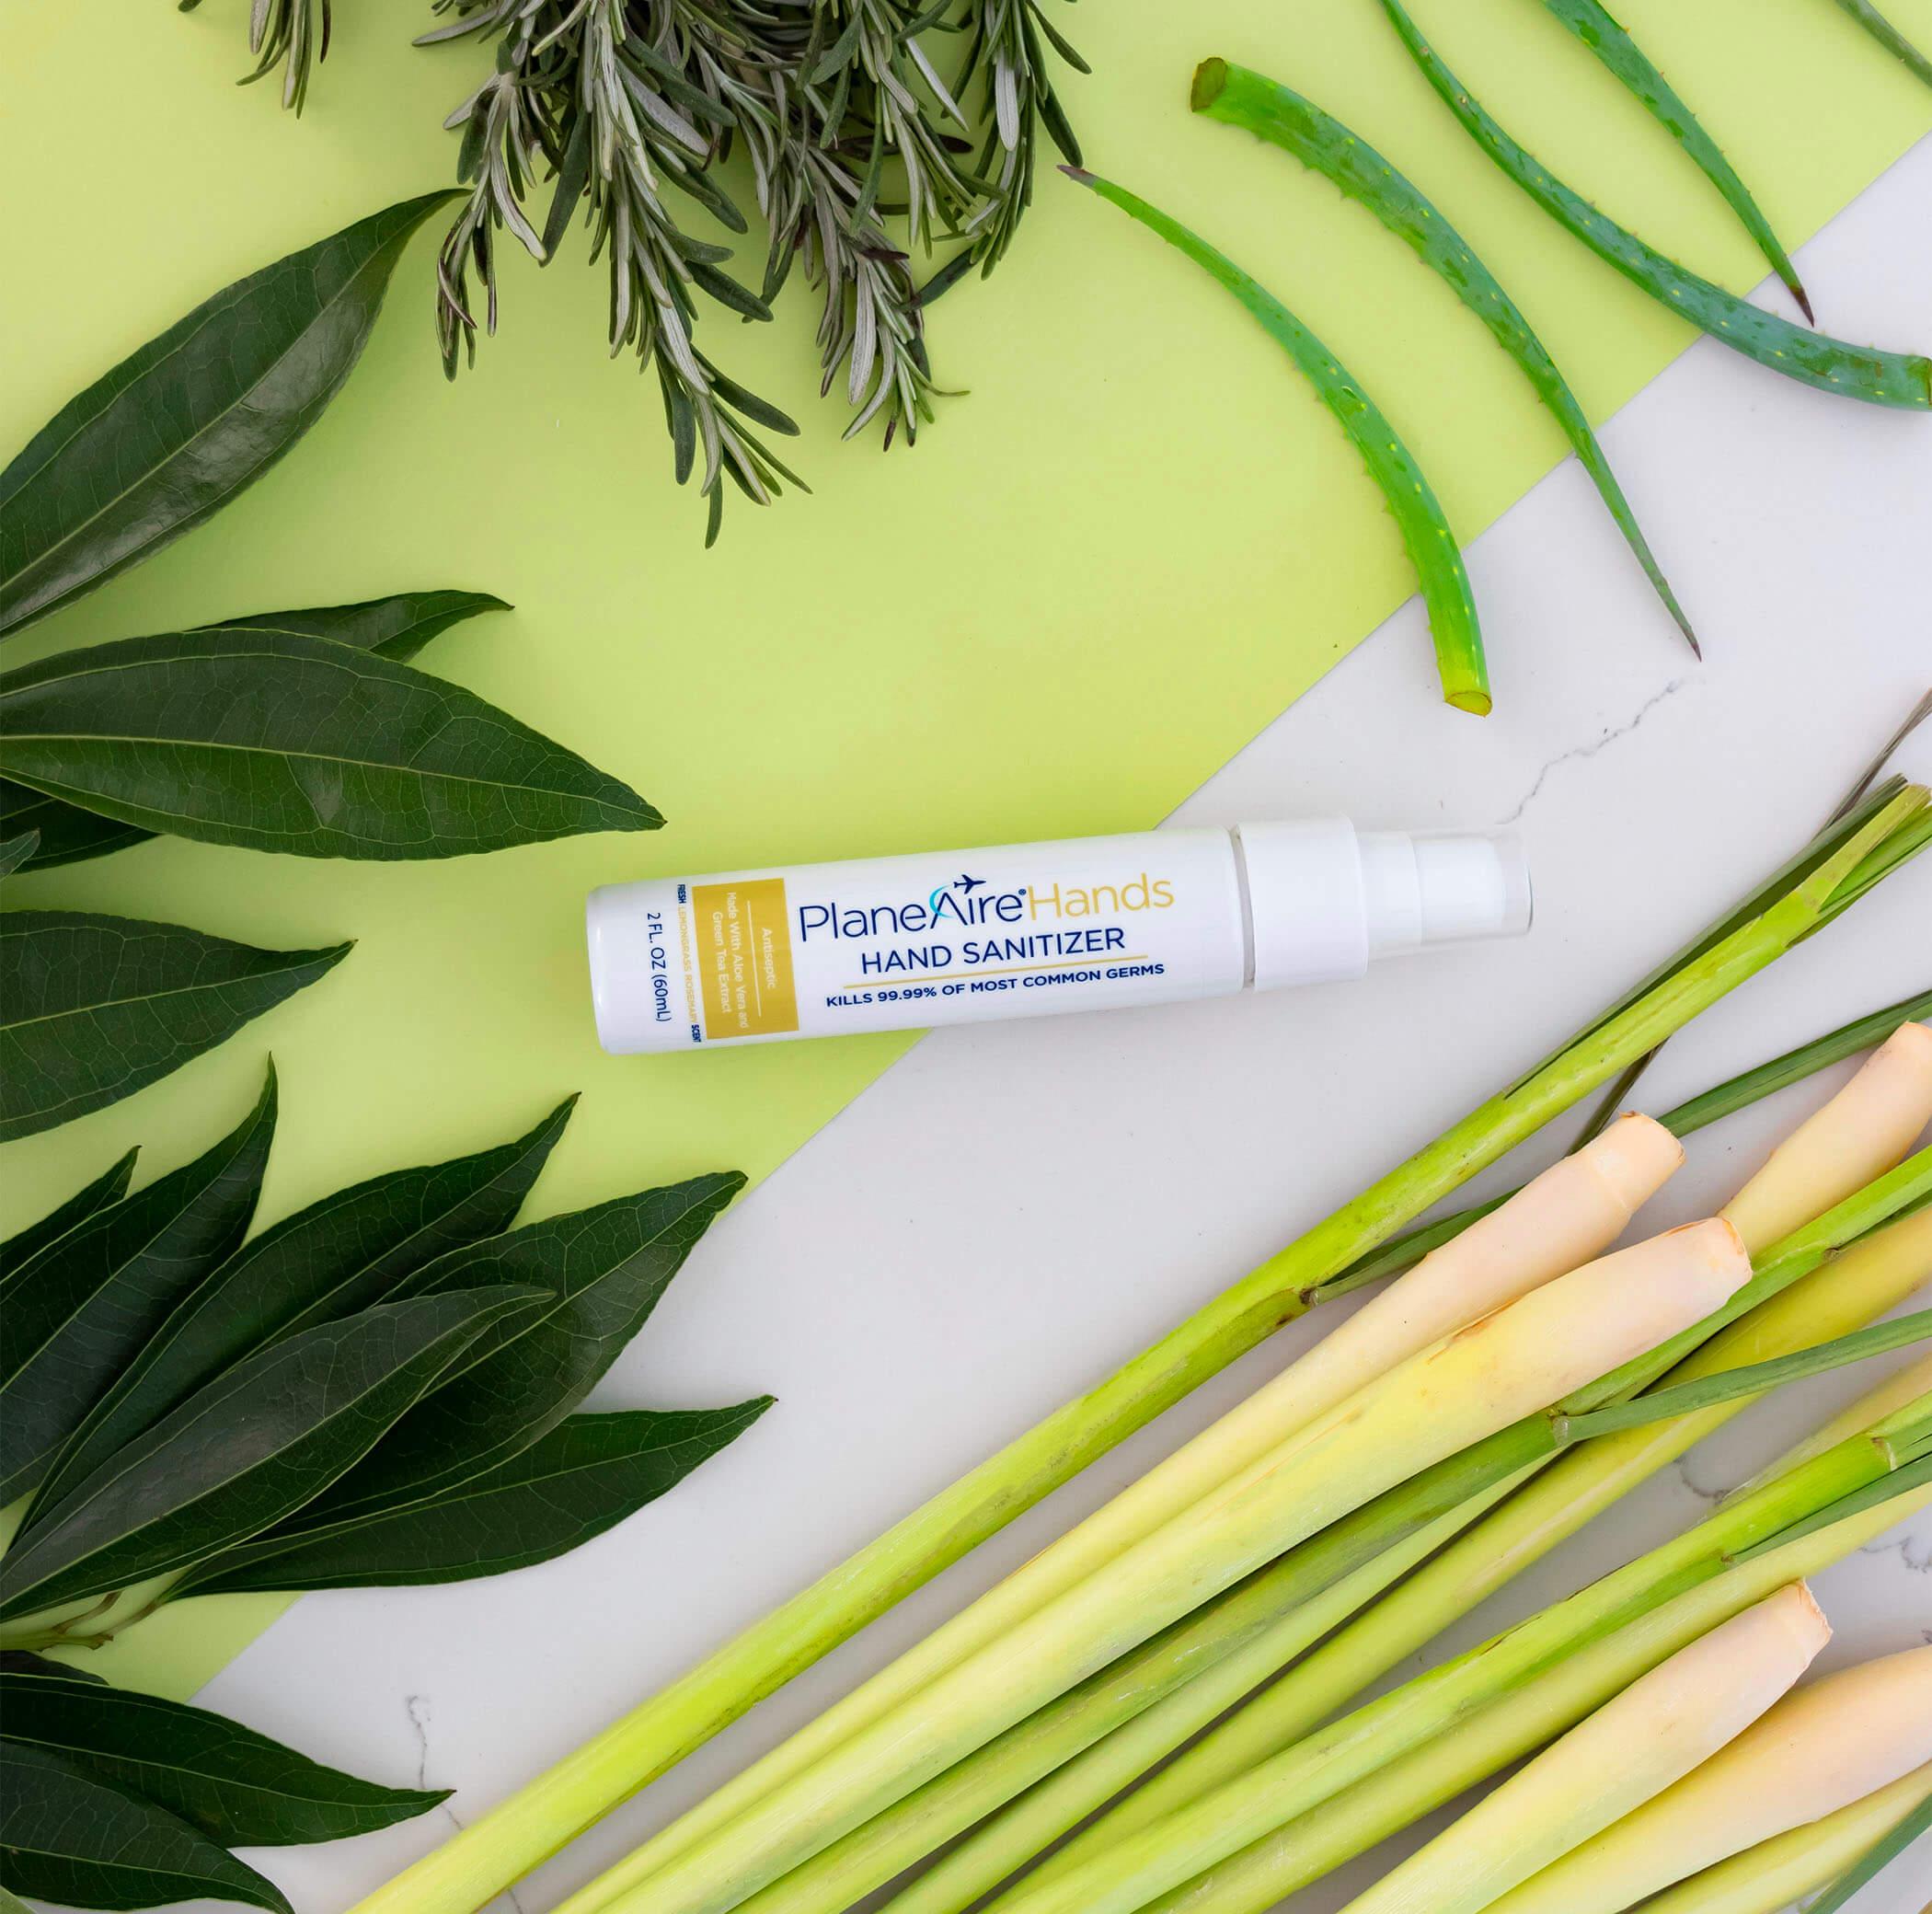 PlaneAire Hands Lemongrass Rosemary Hand Sanitizer